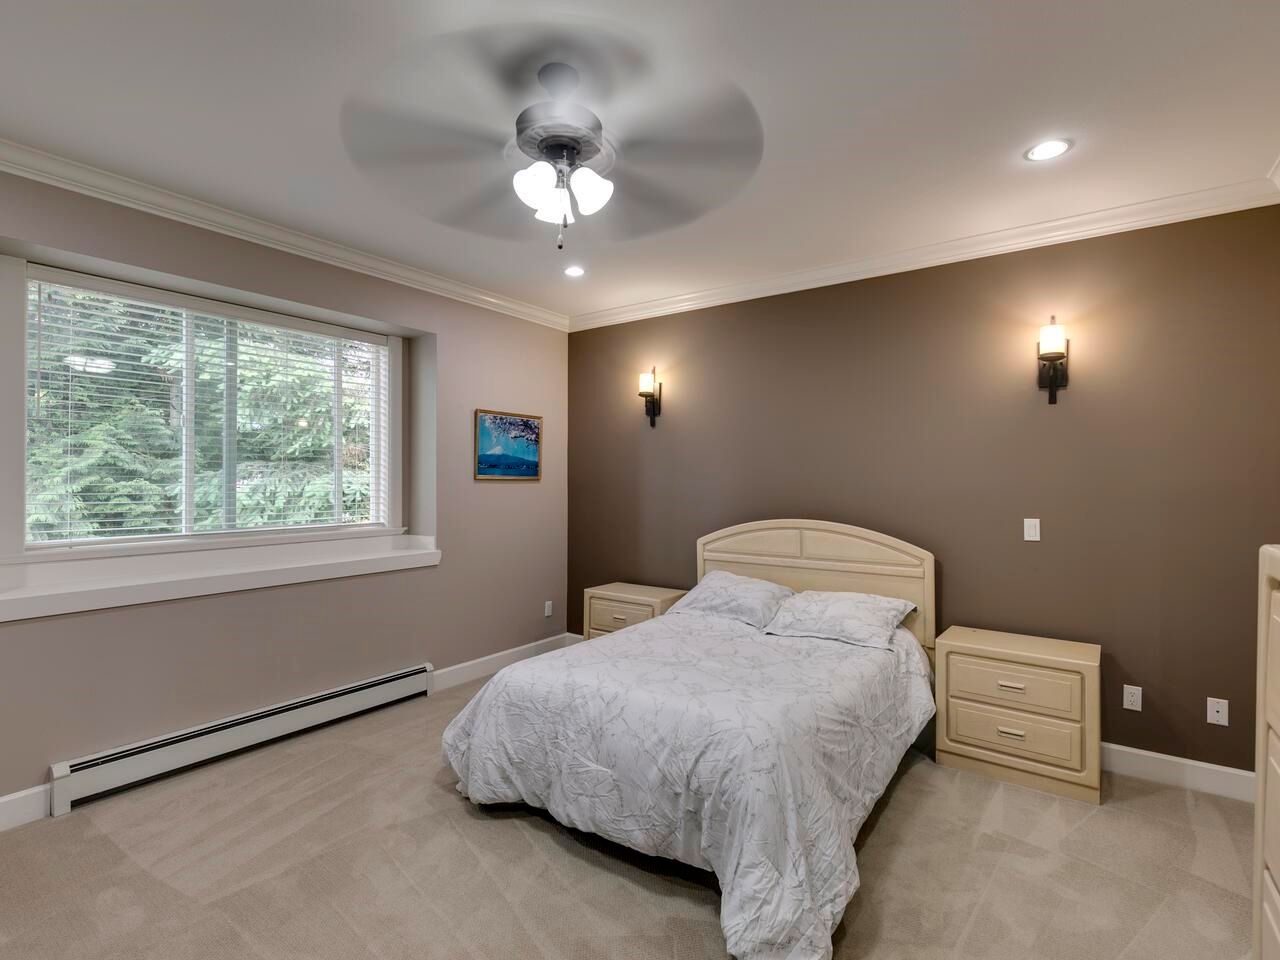 "Photo 18: Photos: 22845 126B Avenue in Maple Ridge: East Central House for sale in ""EAST CENTRAL MAPLE RIDGE"" : MLS®# R2594638"